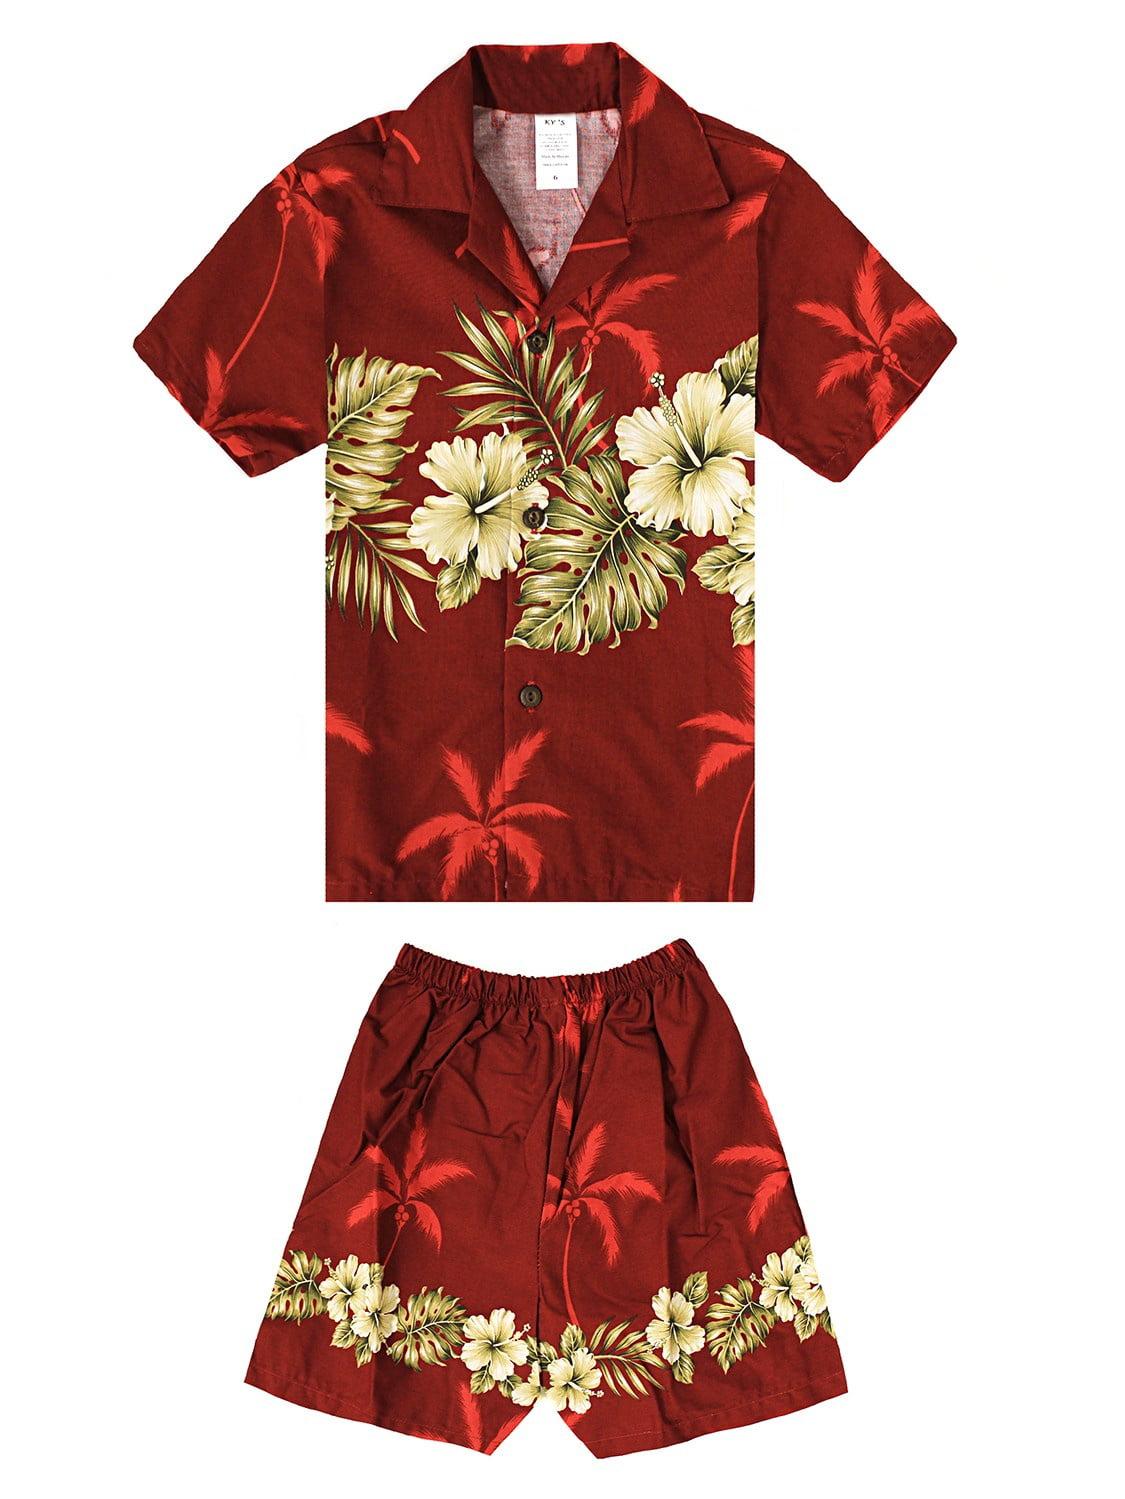 Made in Hawaii Luau Aloha Shirt and Shorts Boy Cabana Set Gloden Hibiscus Cross in Red 8